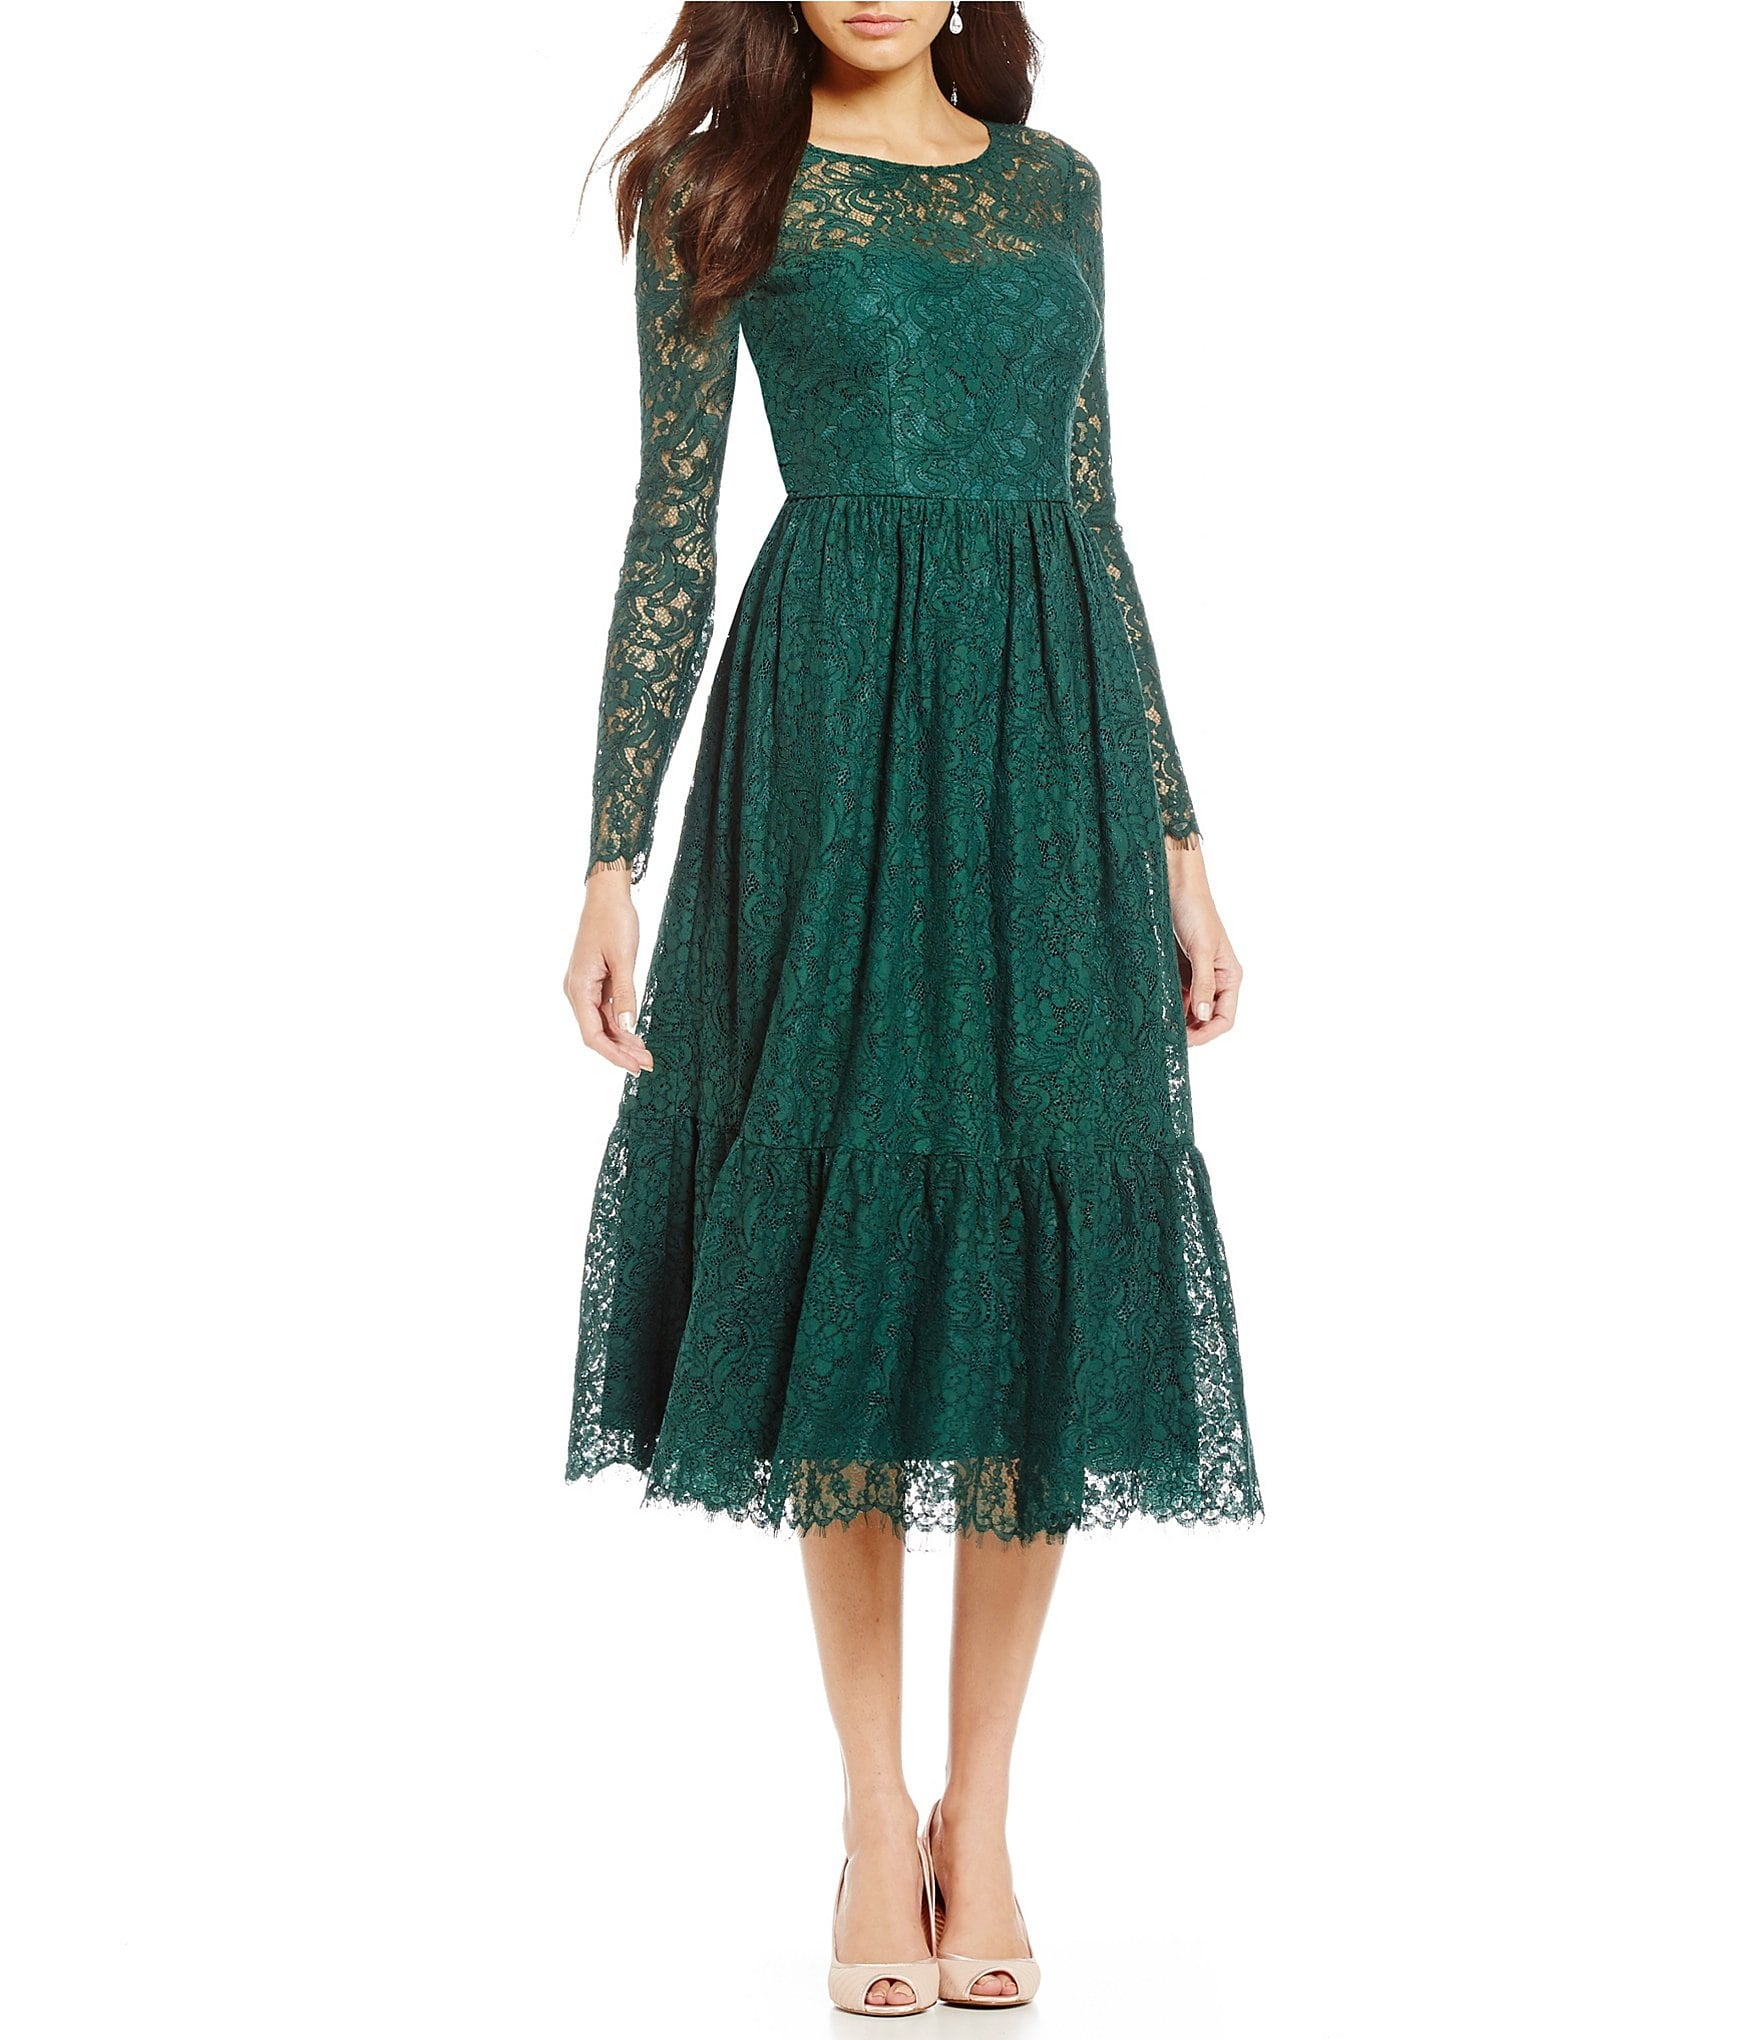 Adrianna Papell Long Sleeve Lace Midi Dress Dillards